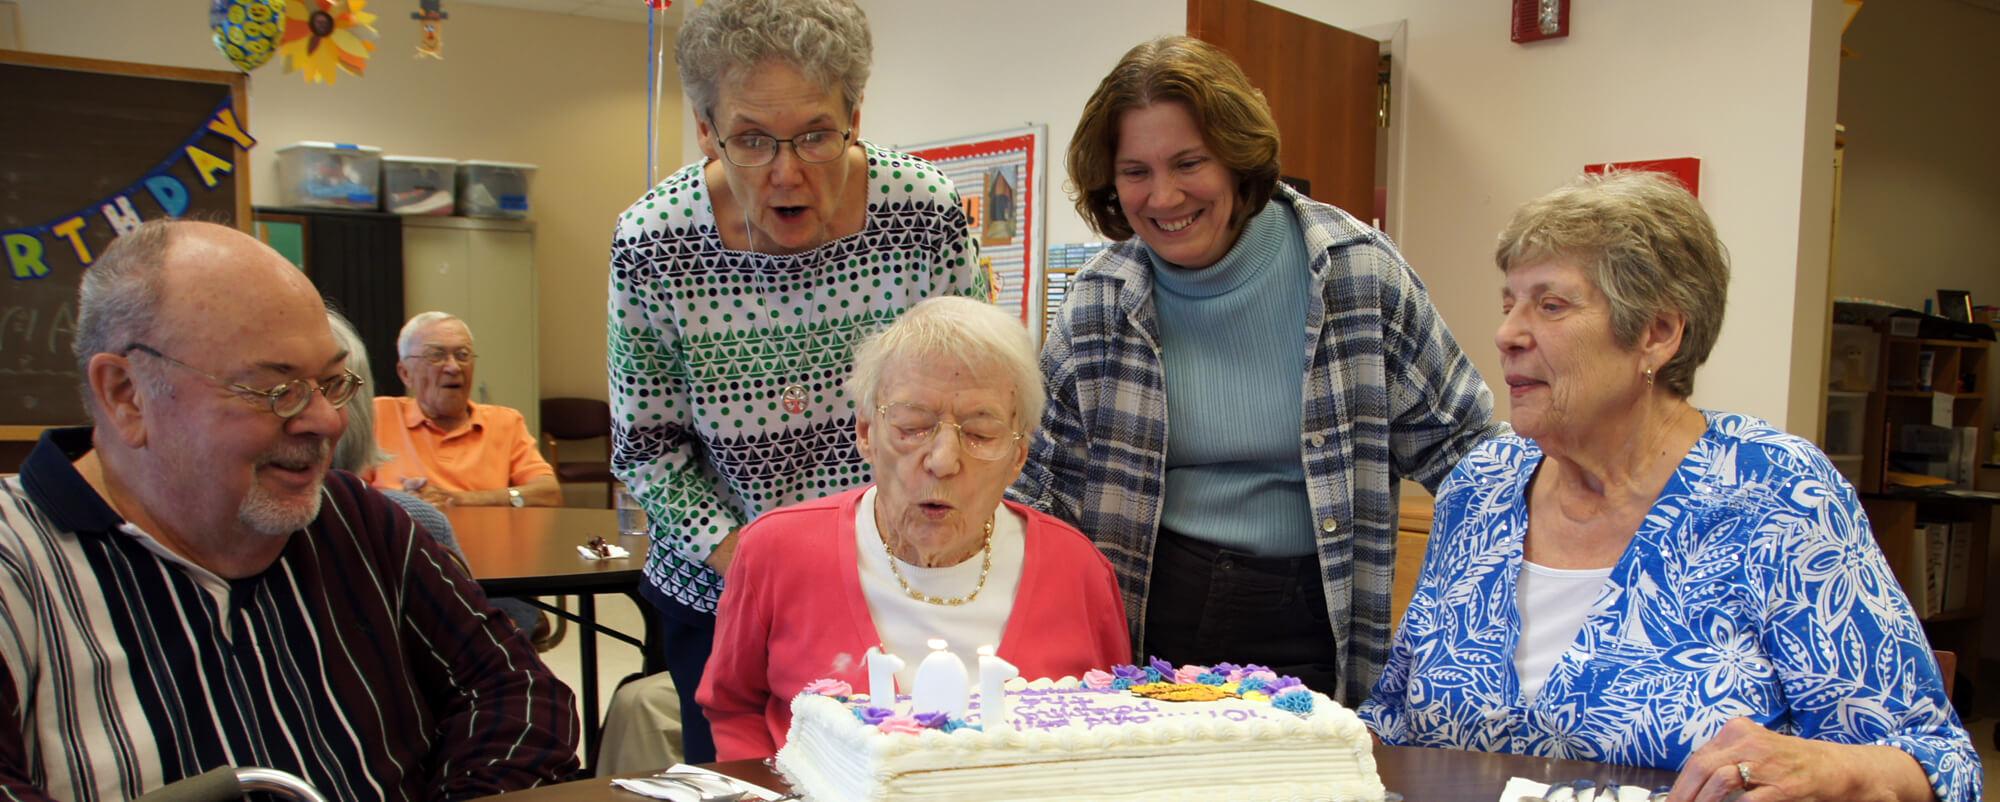 Seton Center Adult Day Care